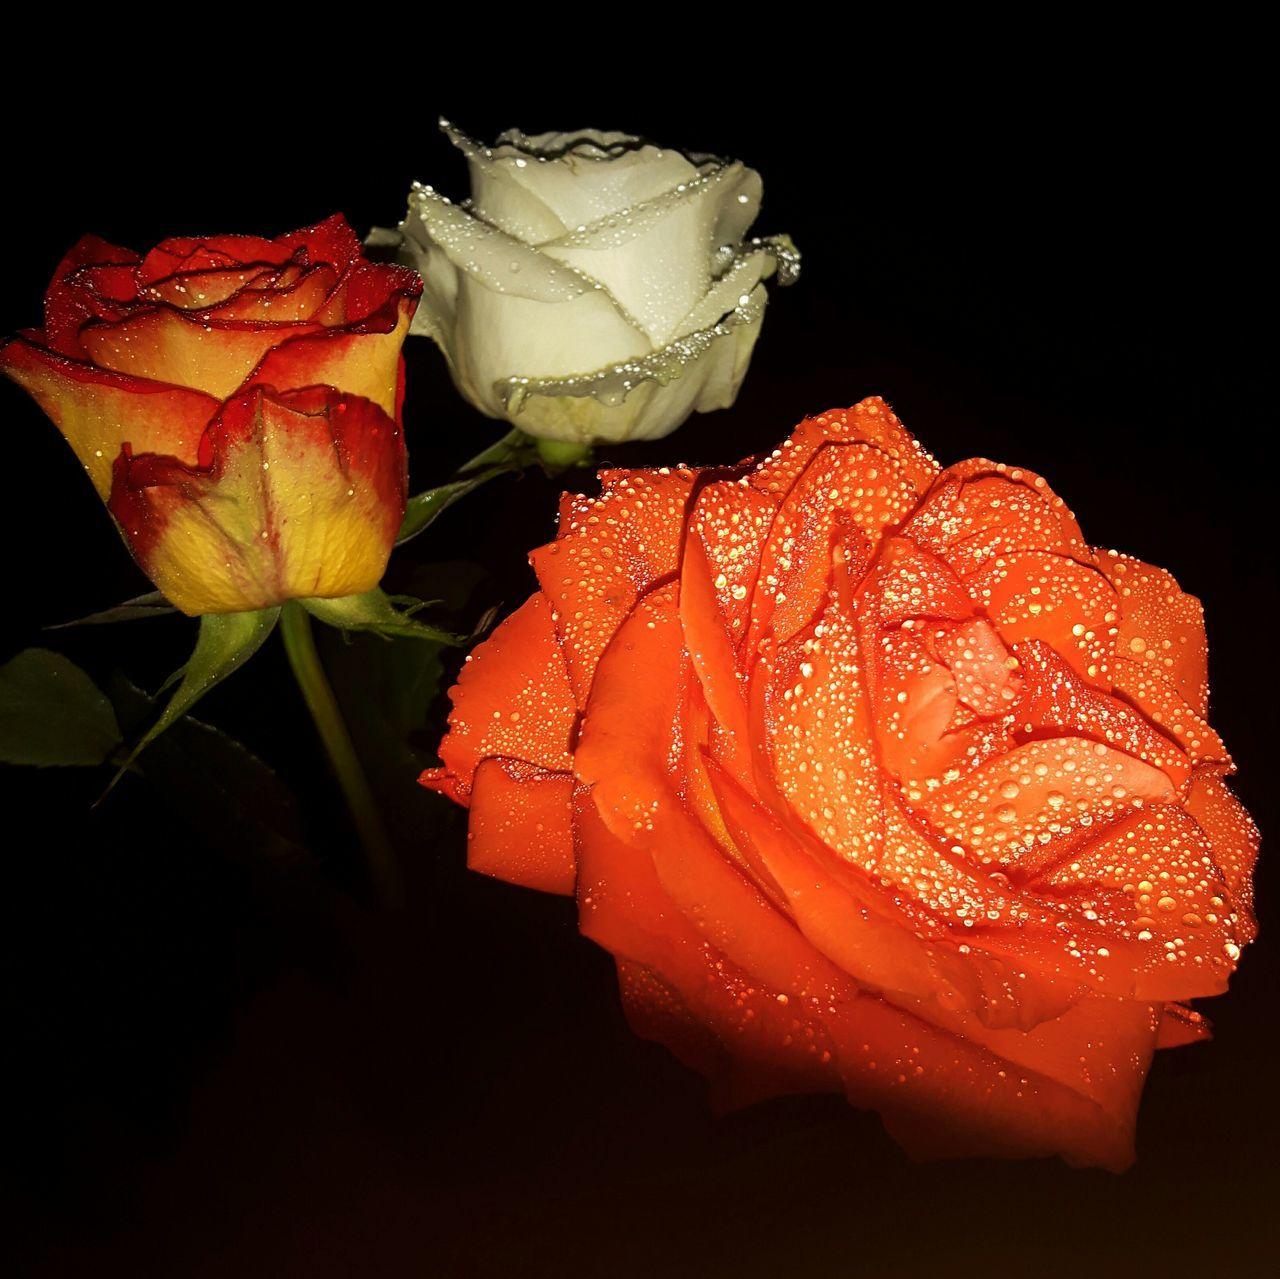 Good Night 🌙 Flower Rose - Flower Flower Head Plant Nature Night Beauty In Nature Blumenpracht🌺🍃 Roses🌹 Rosen Germany🇩🇪 EyeEm Best Shots Beliebte Fotos Germany Photos Official EyeEm © GERMANY🇩🇪DEUTSCHERLAND@ Beauty In Nature Day Nature Plant Blumenfotografie Beatiful Rose🌹 Roses Flowers  Flowerphotography Natural Beauty